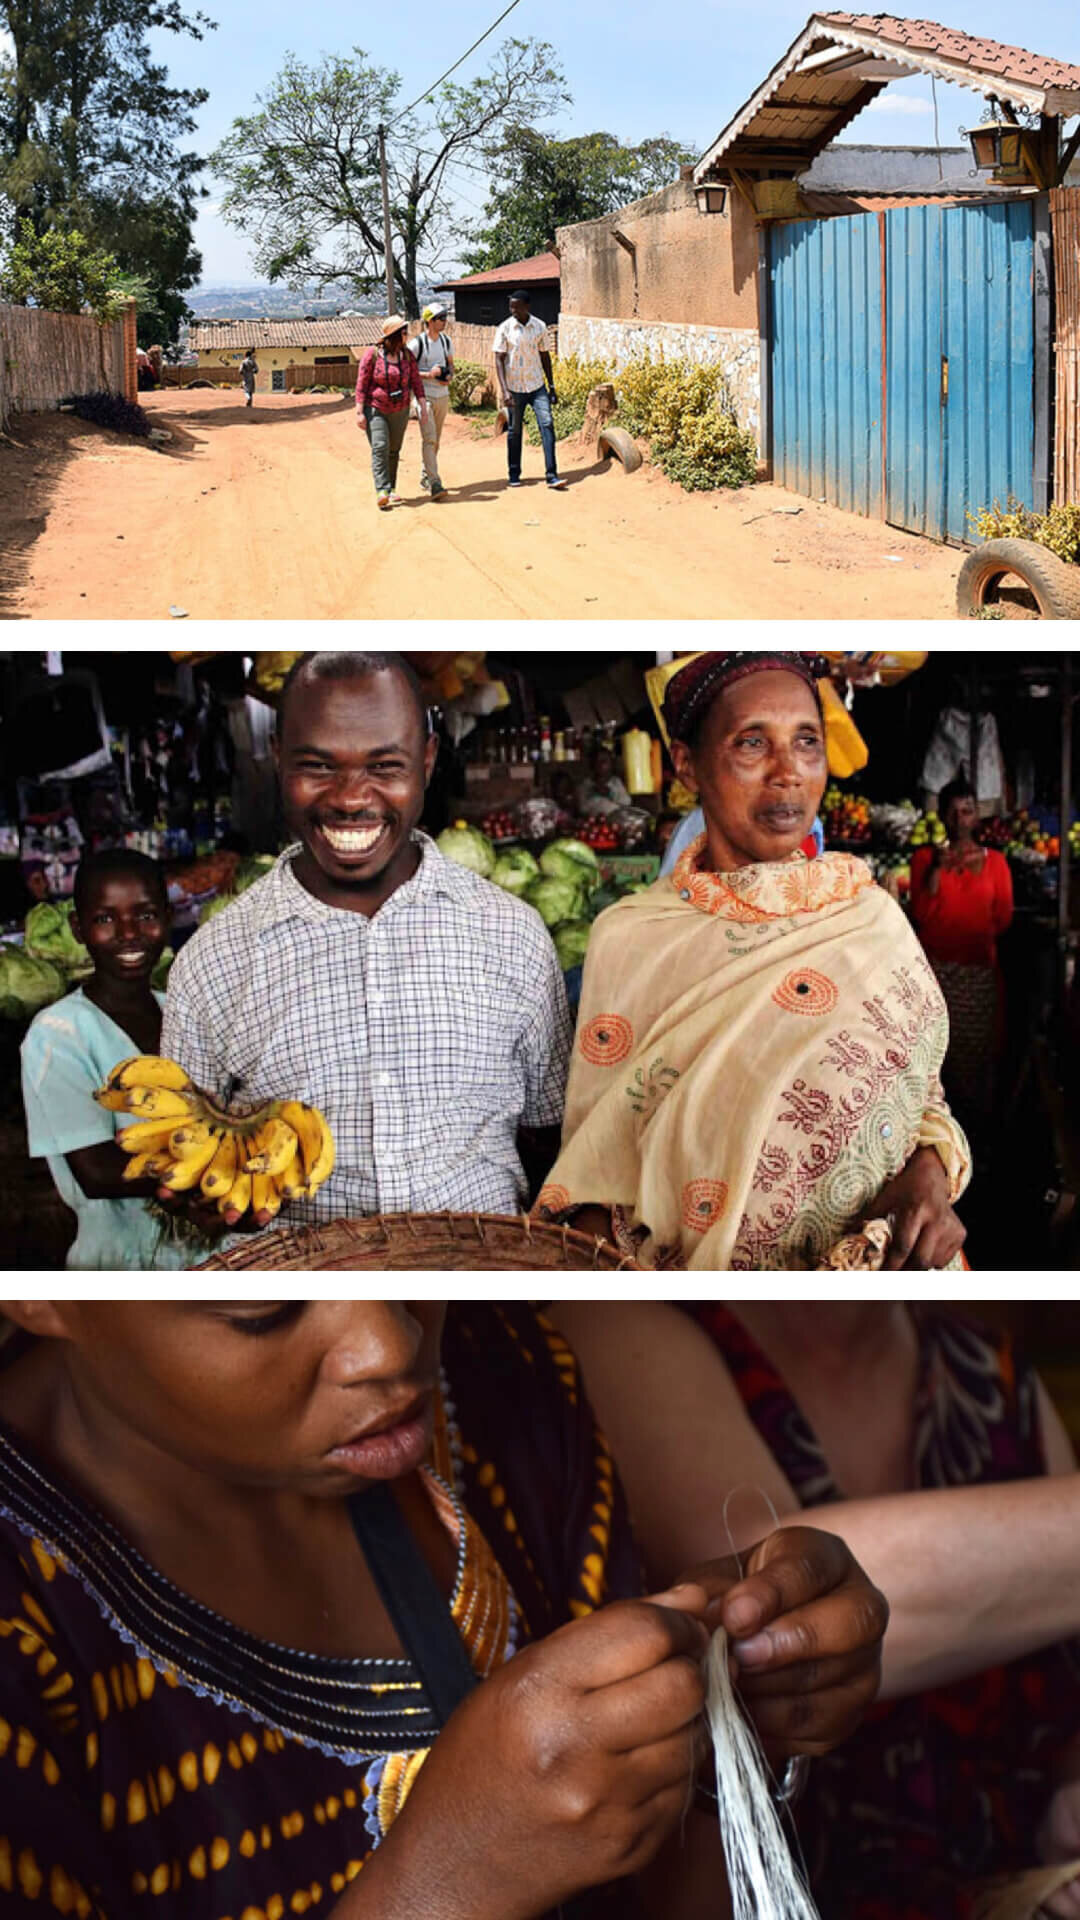 13.experience authenticity at the Nyamirambo Women's Center